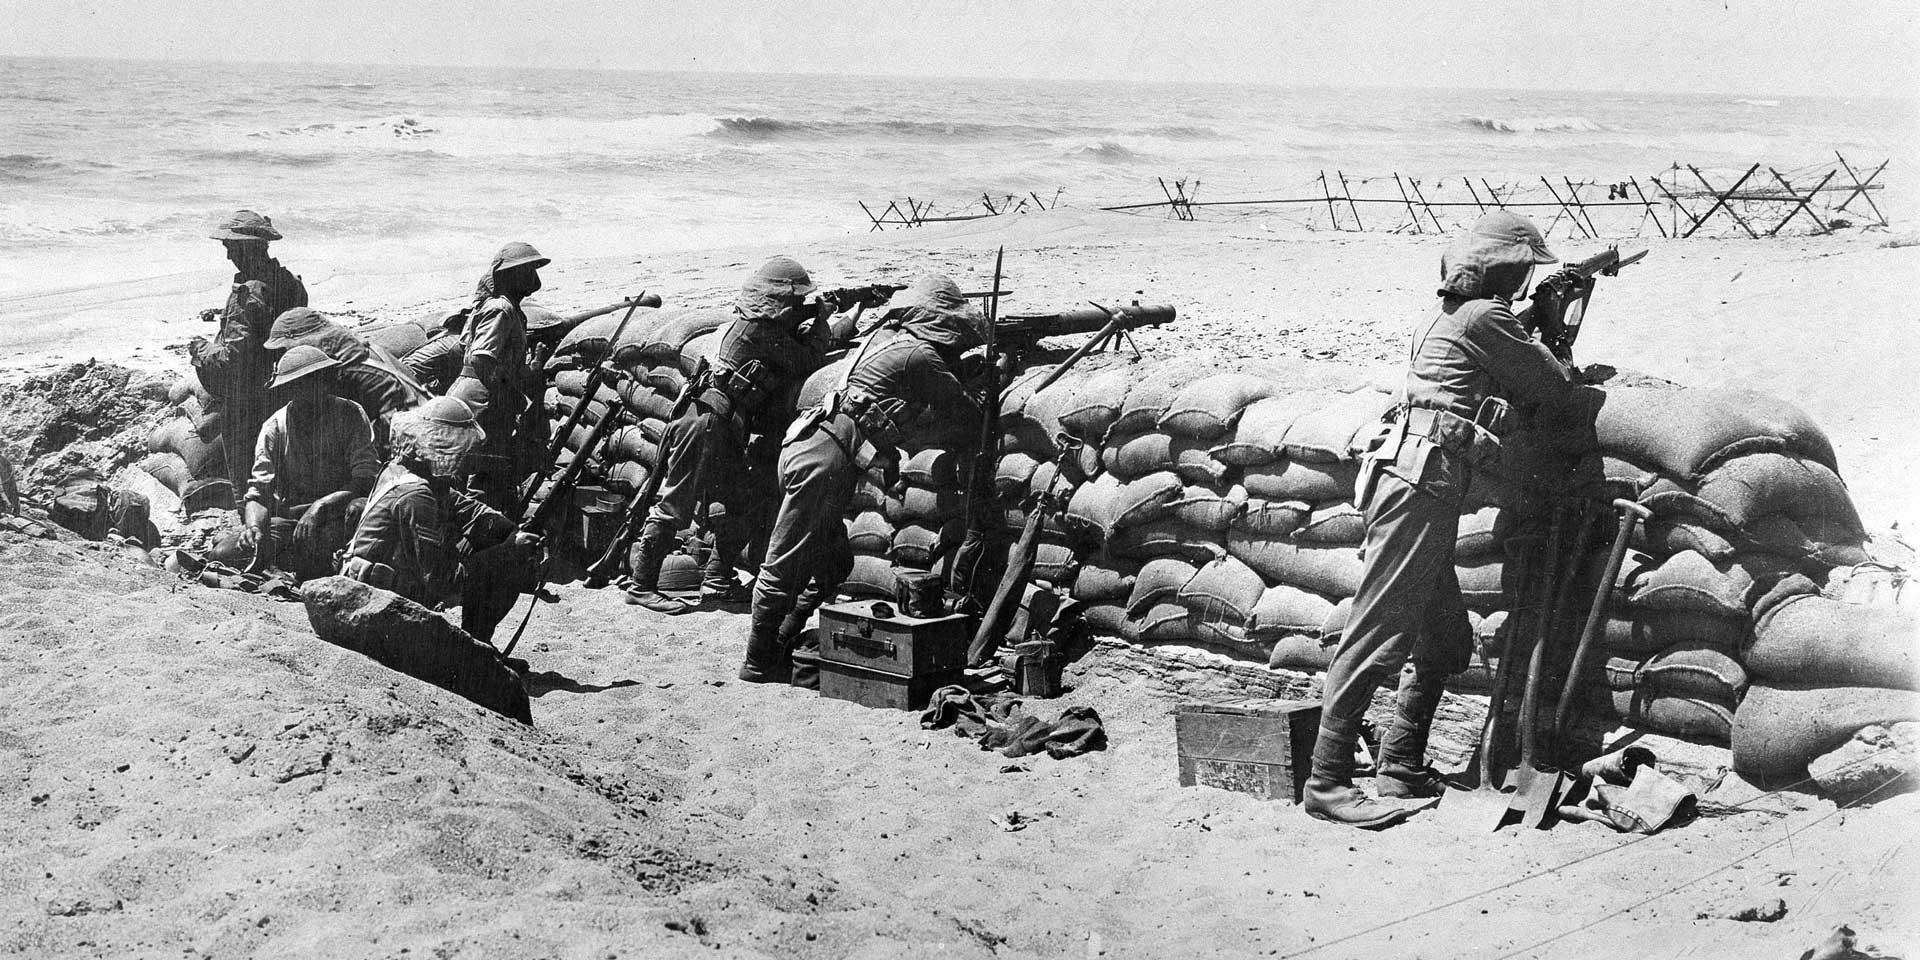 The Black Watch (Royal Highlanders) behind sandbag defences on the coast near Arsuf, 1918